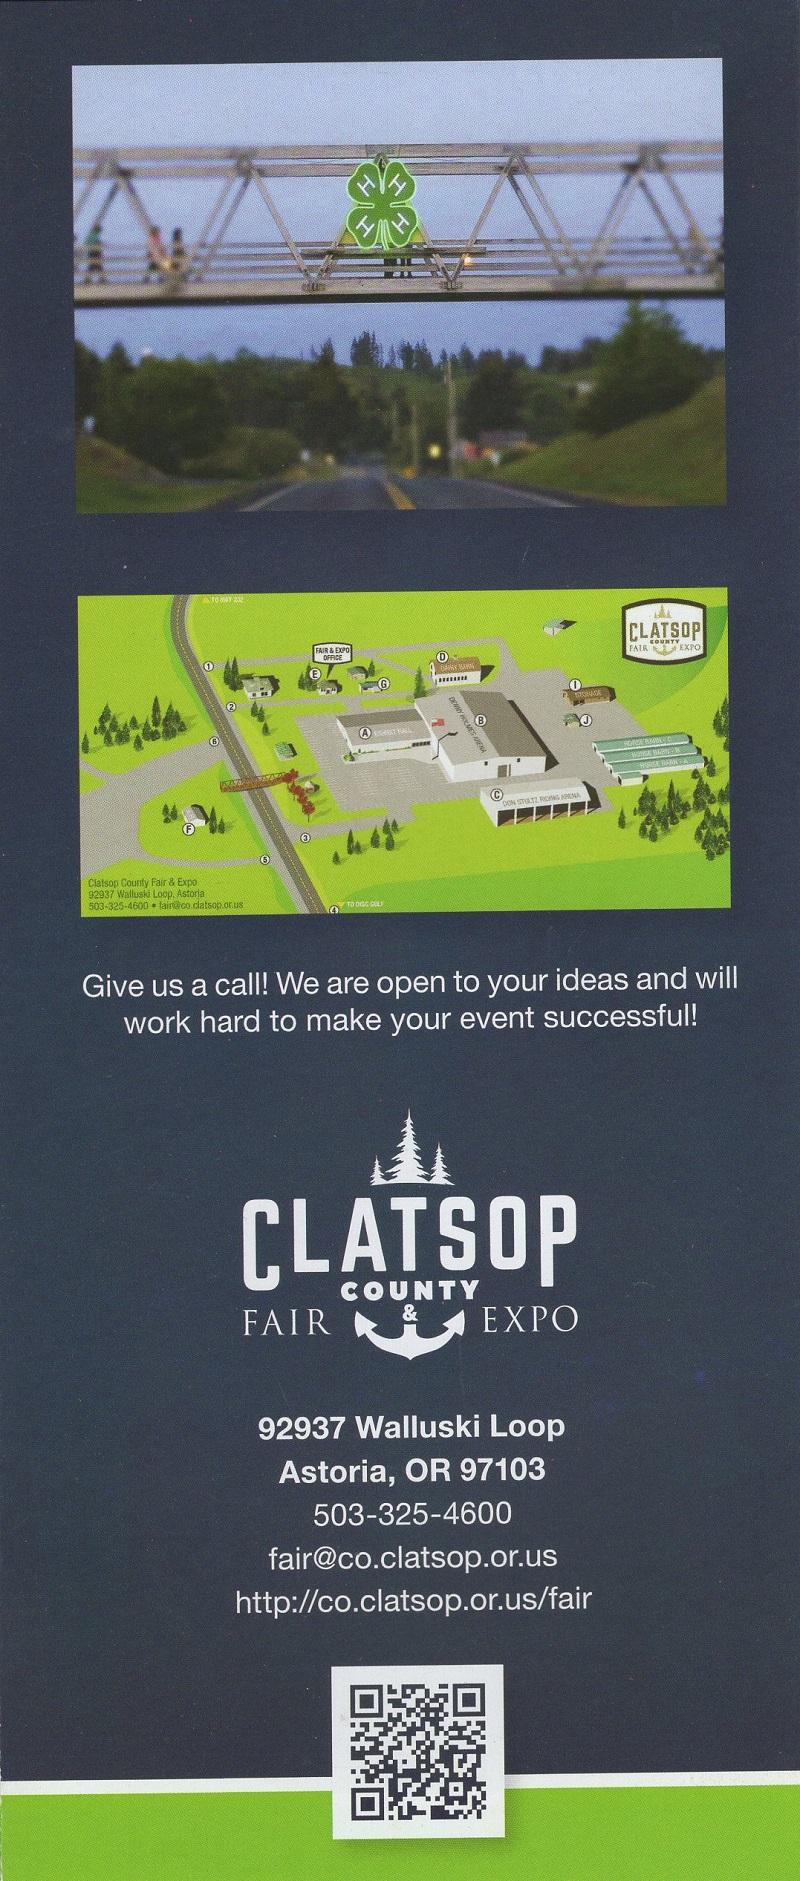 Clatsop County Fair & Expo brochure thumbnail